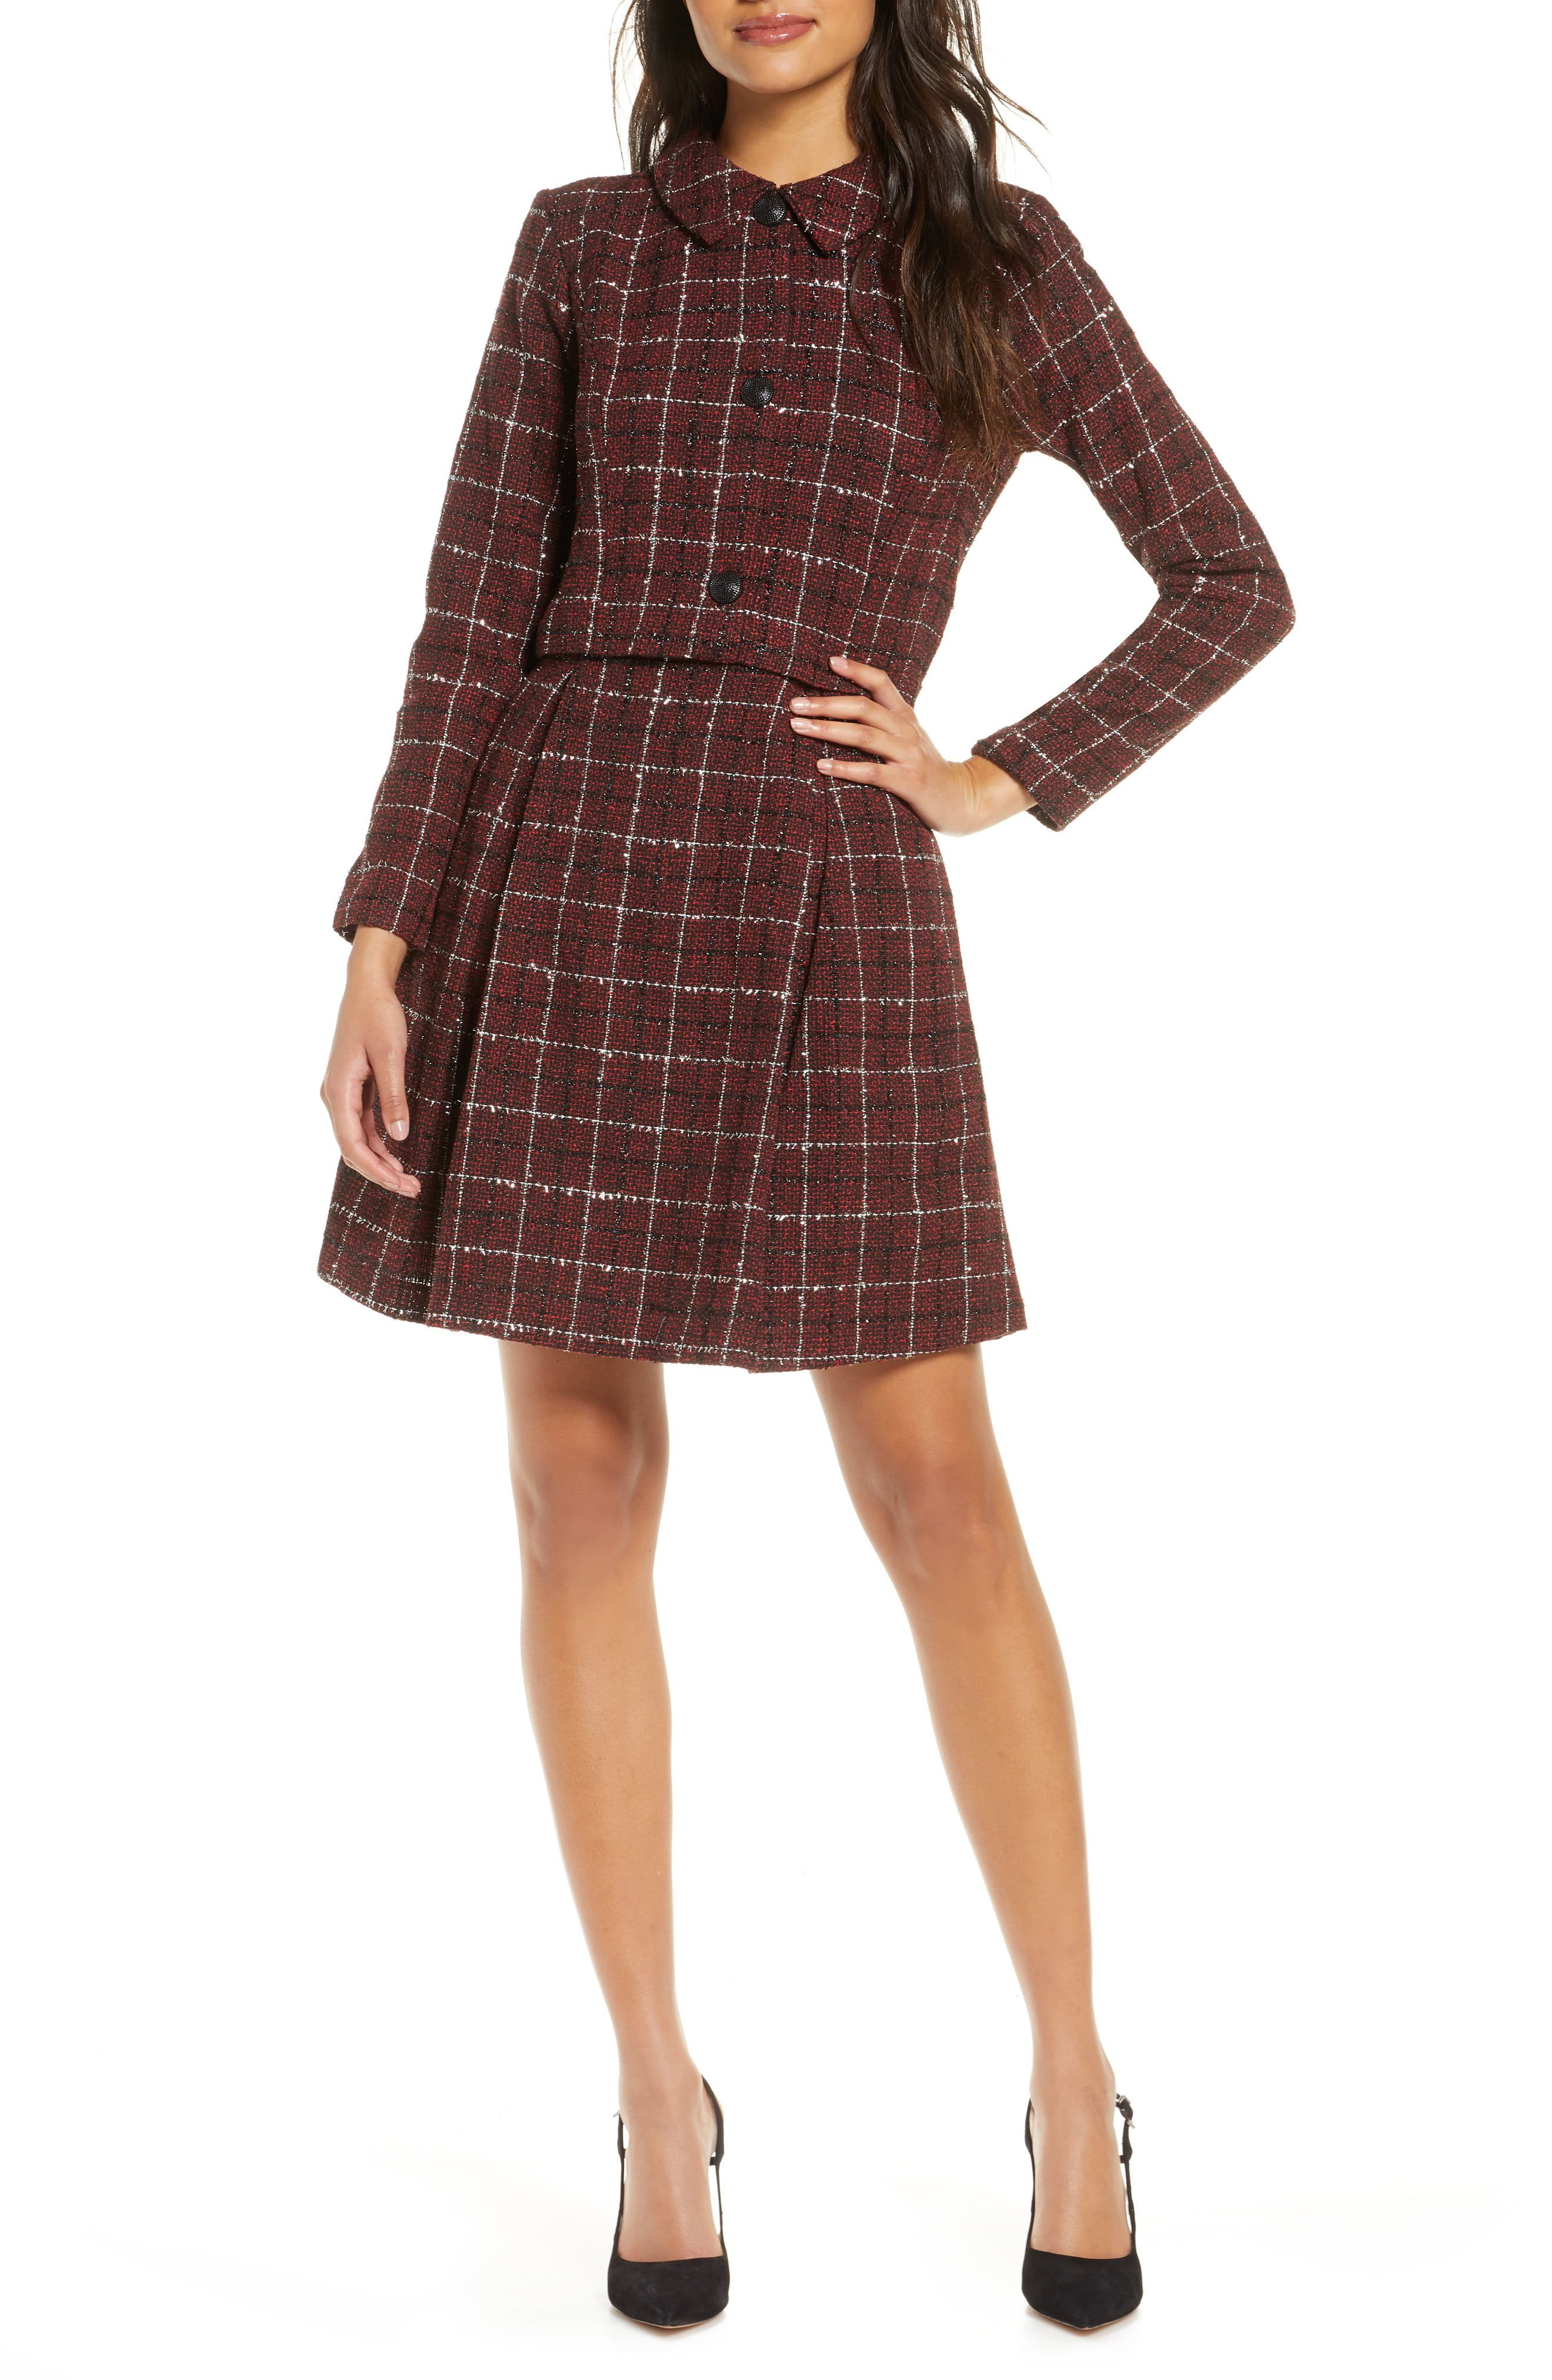 Julia Jordan Long Sleeve Mock Two-Piece Tweed Dress | Tweed dress, Nordstrom dresses, Clothes for women